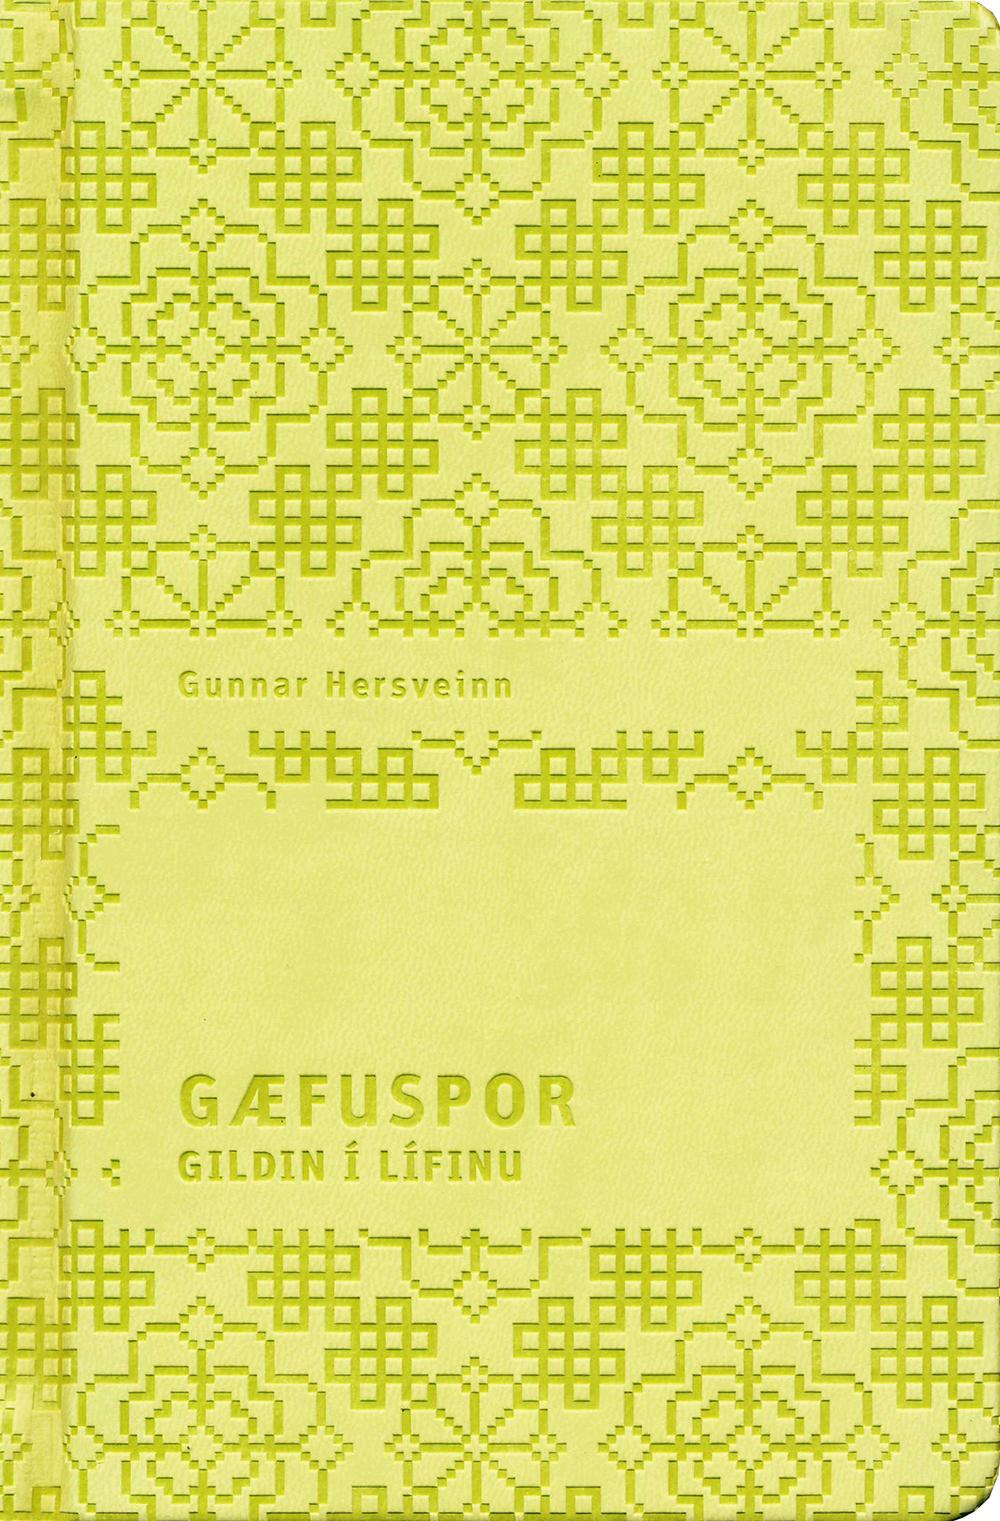 Gæfuspor – Gildin í lífinu